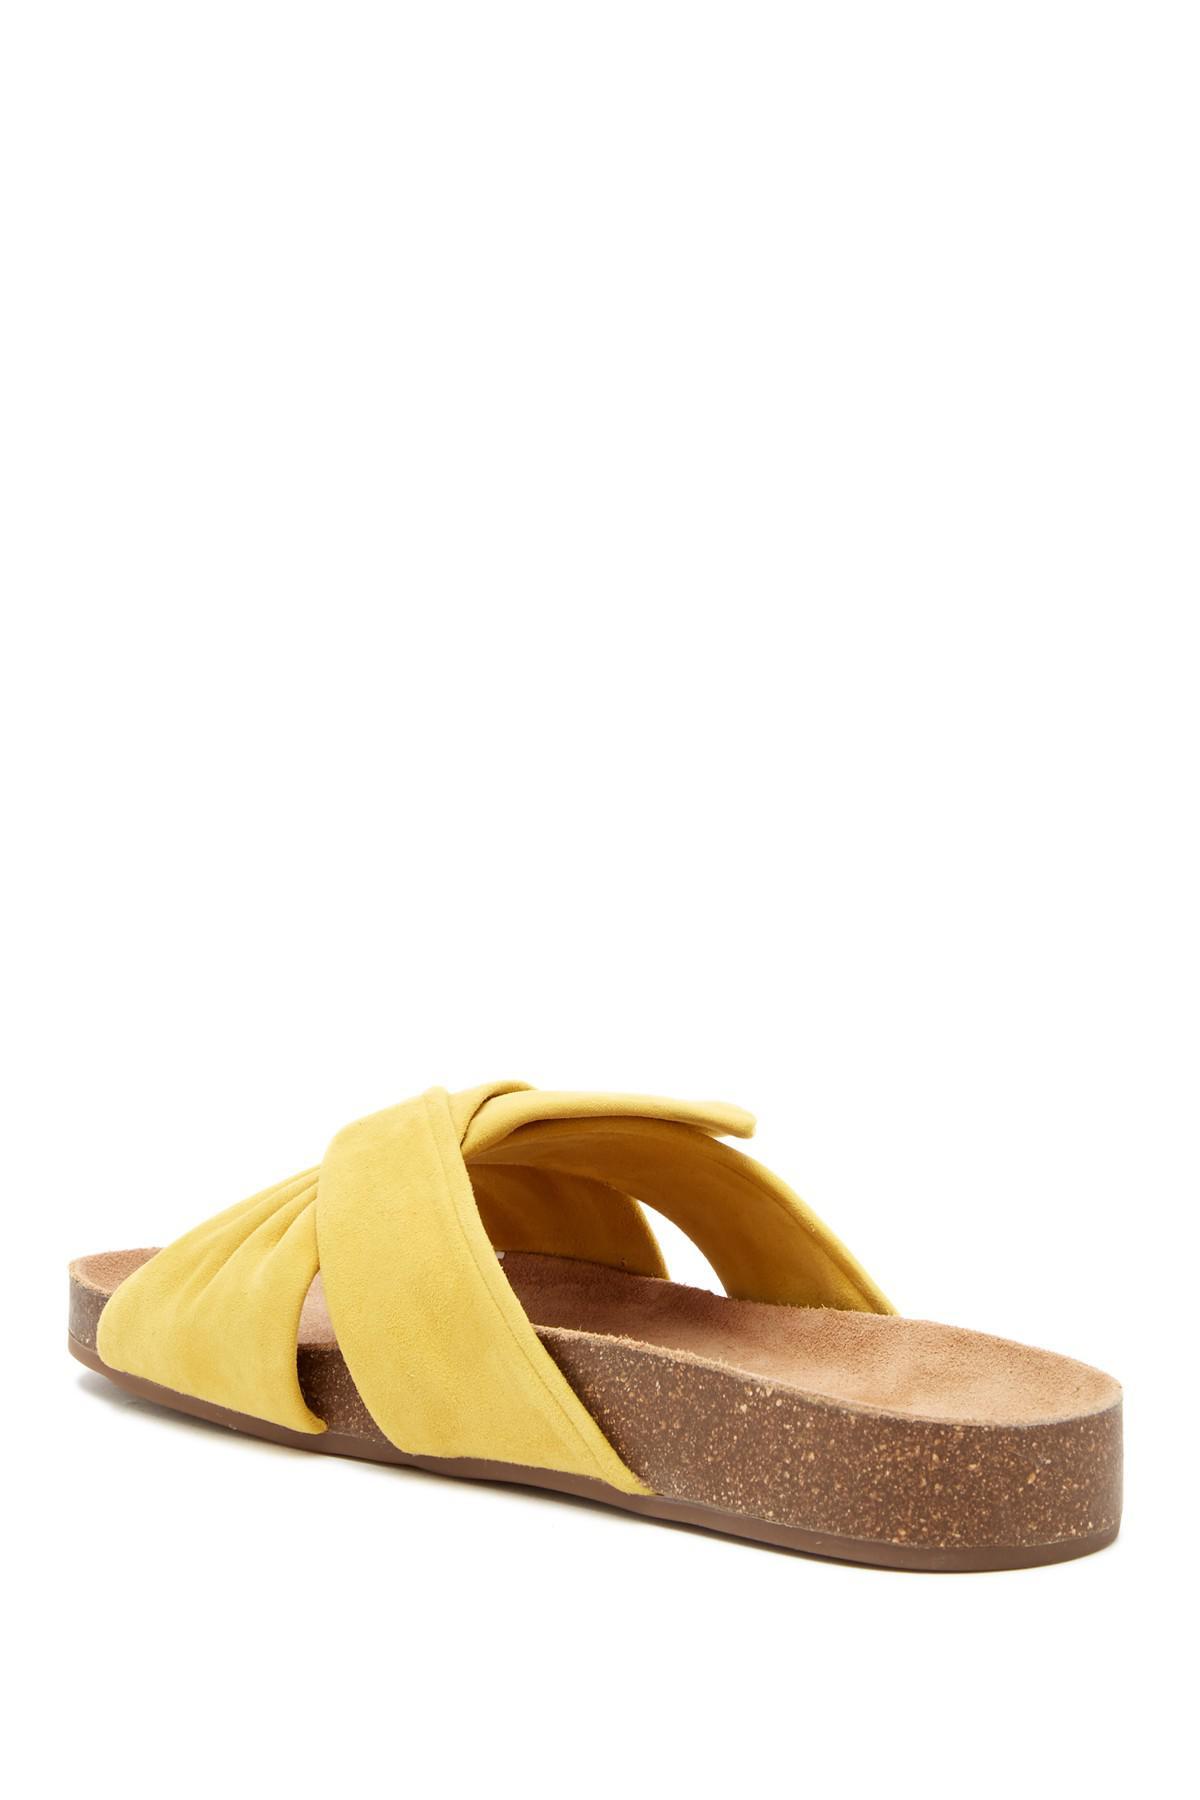 9f70c08ffb9 Lyst - Vince Camuto Berulia Suede Slide Sandal in Yellow